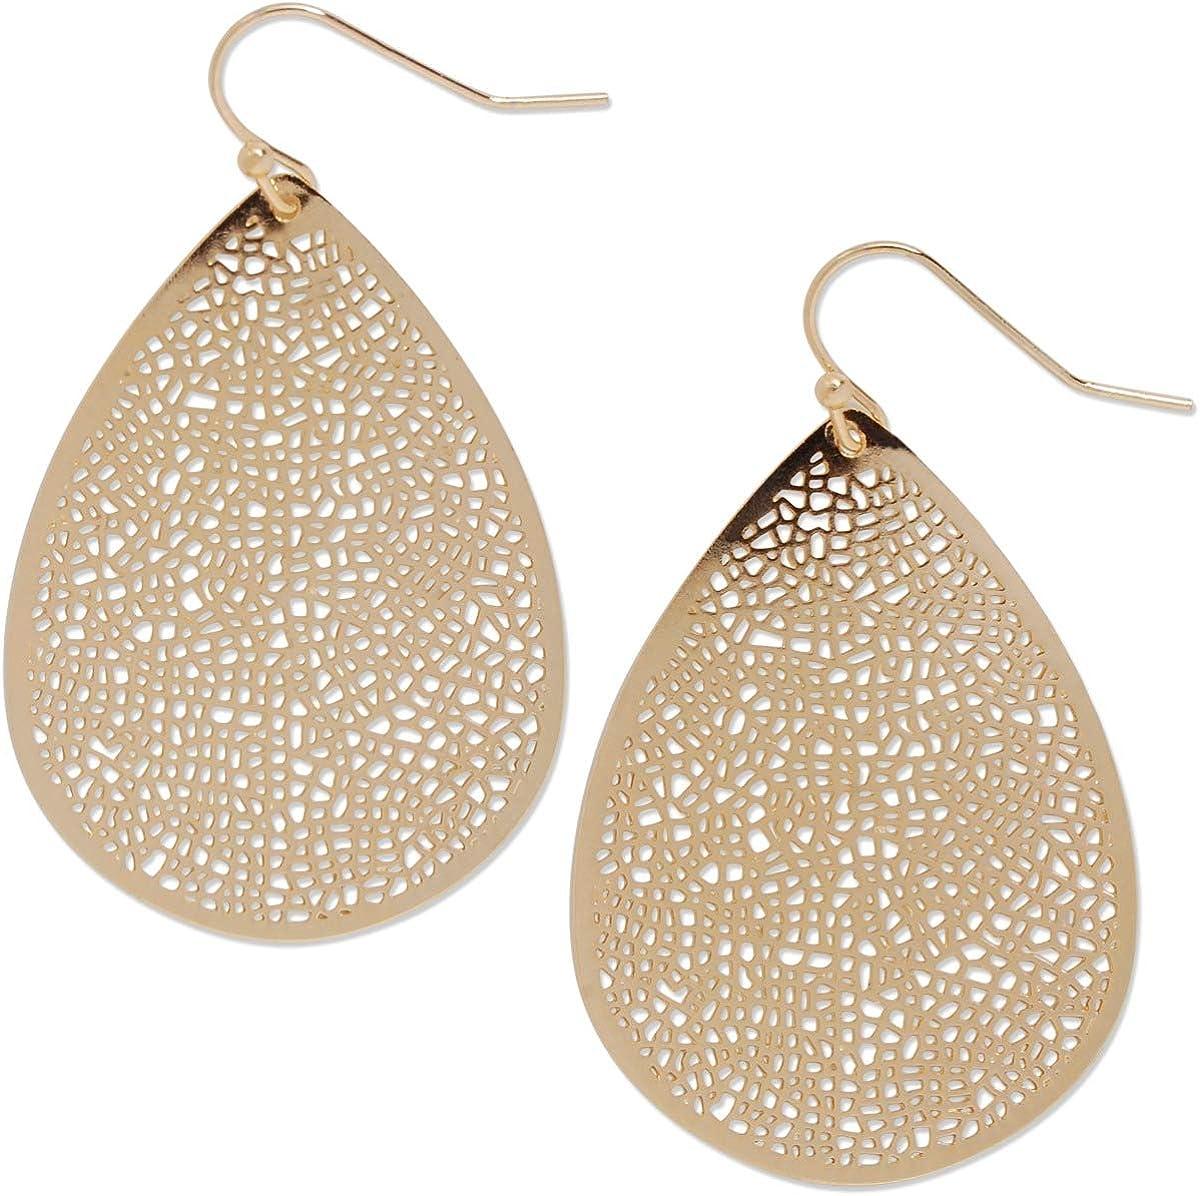 Humble Chic Filigree Dangle Earrings - Vintage-Style Teardrop Lightweight Statement Cutout Dangling Drops for Women